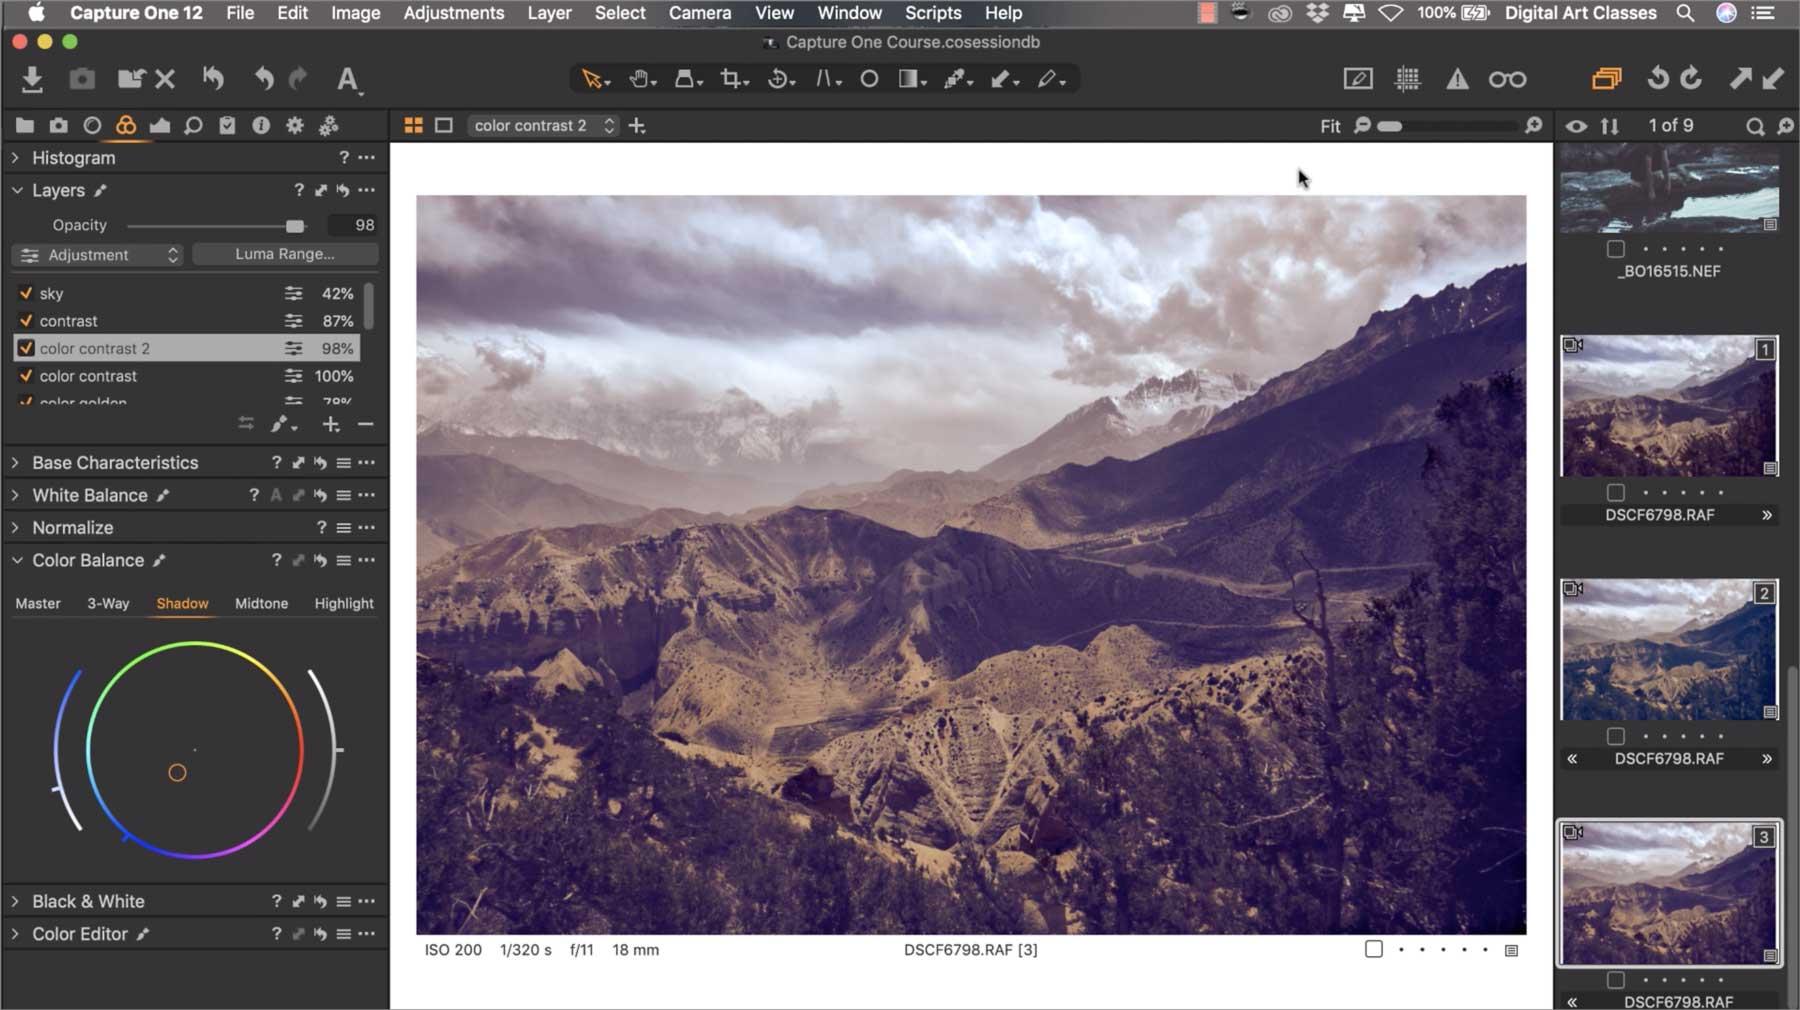 Complete Photo Edit: Upper Mustang Region, Nepal